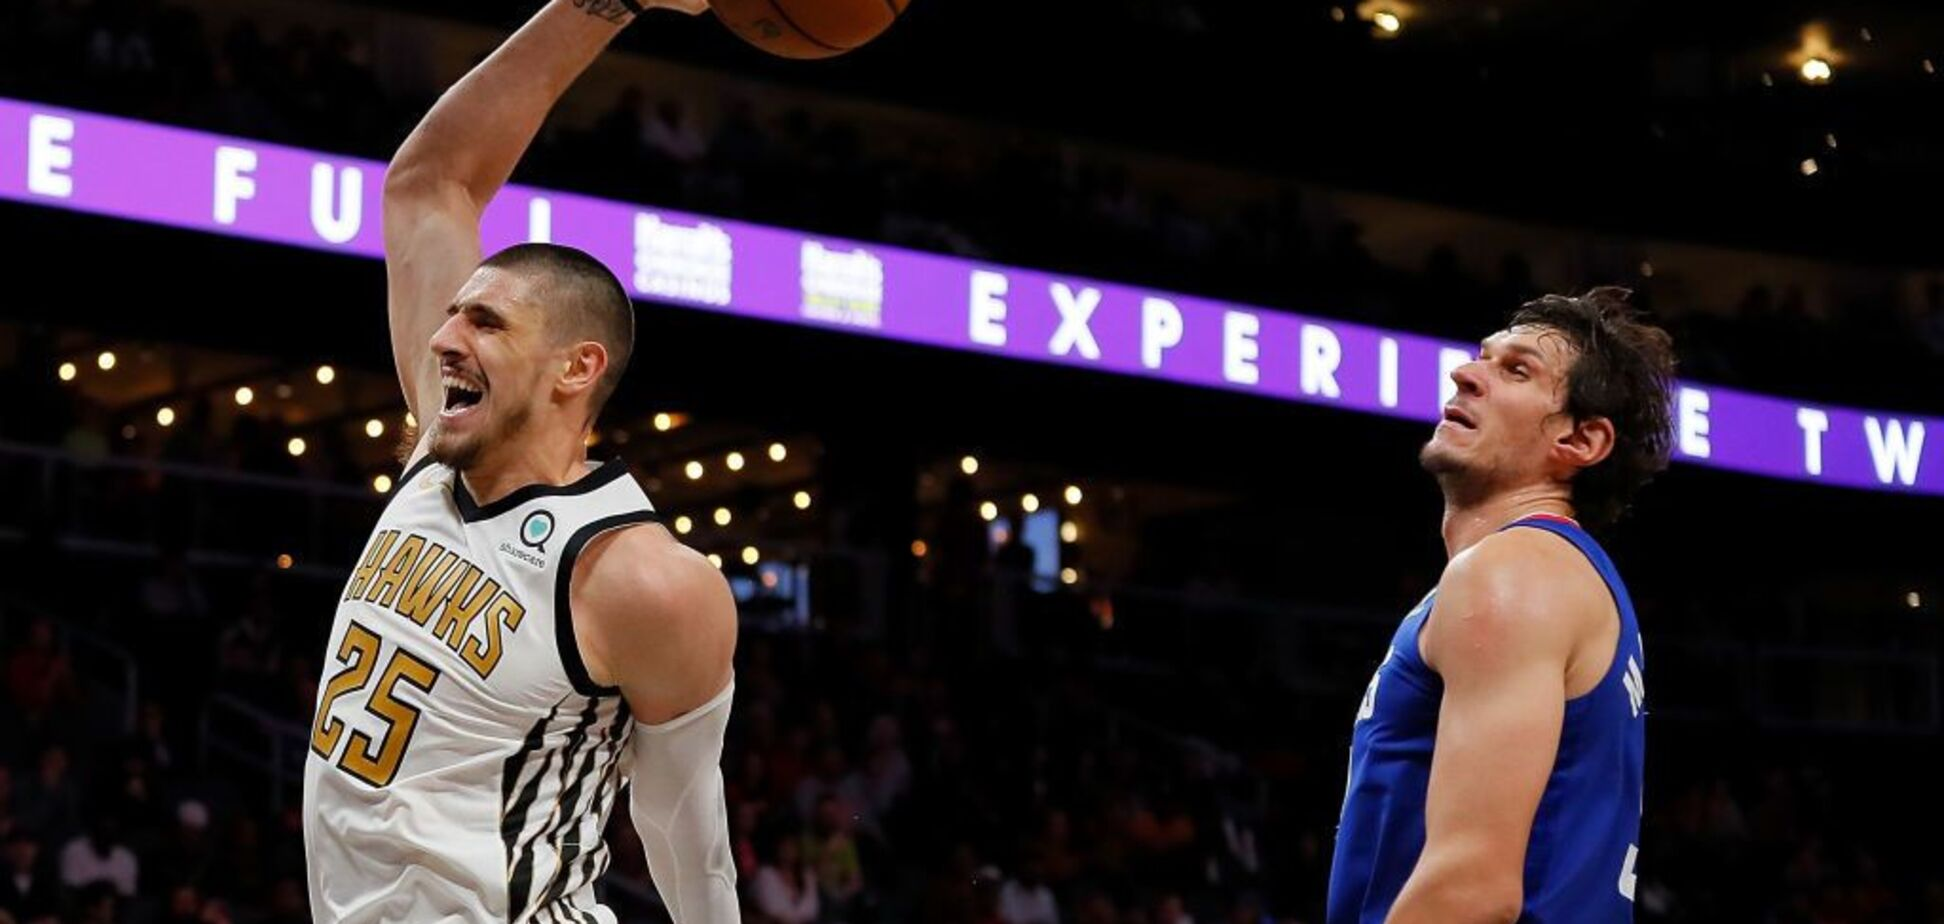 Украинец Лэнь установил рекорд в матче НБА